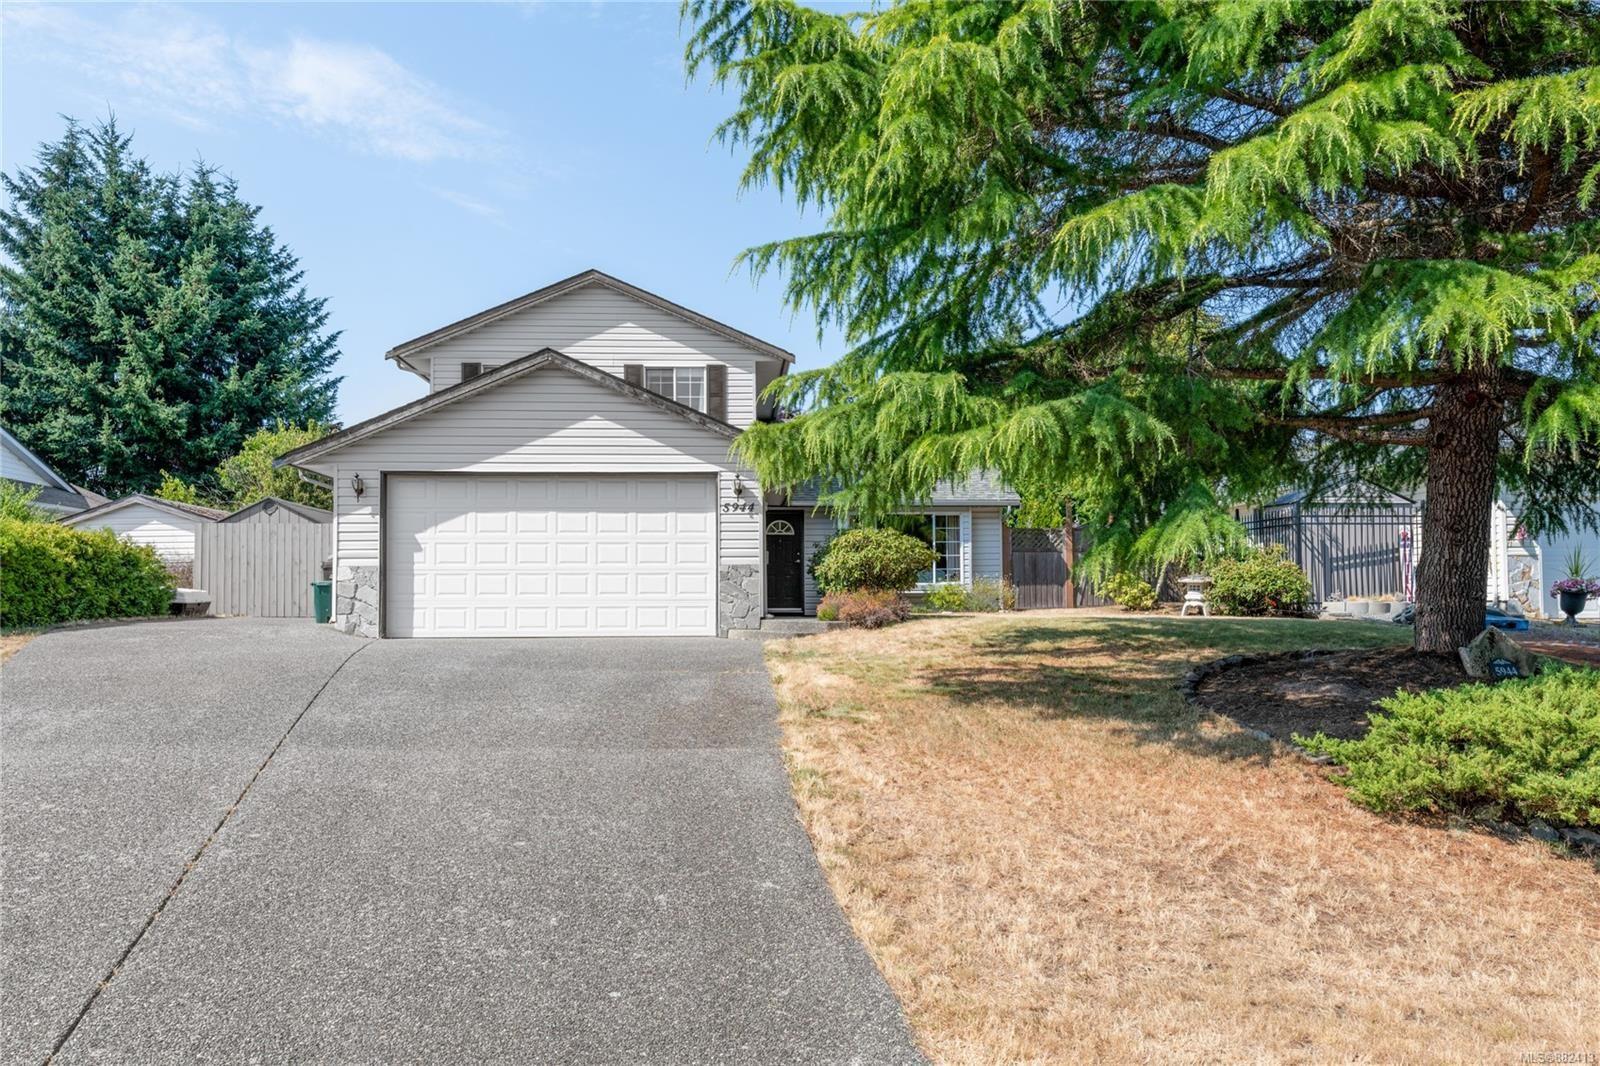 Main Photo: 5944 Devon Pl in : Na North Nanaimo House for sale (Nanaimo)  : MLS®# 882413